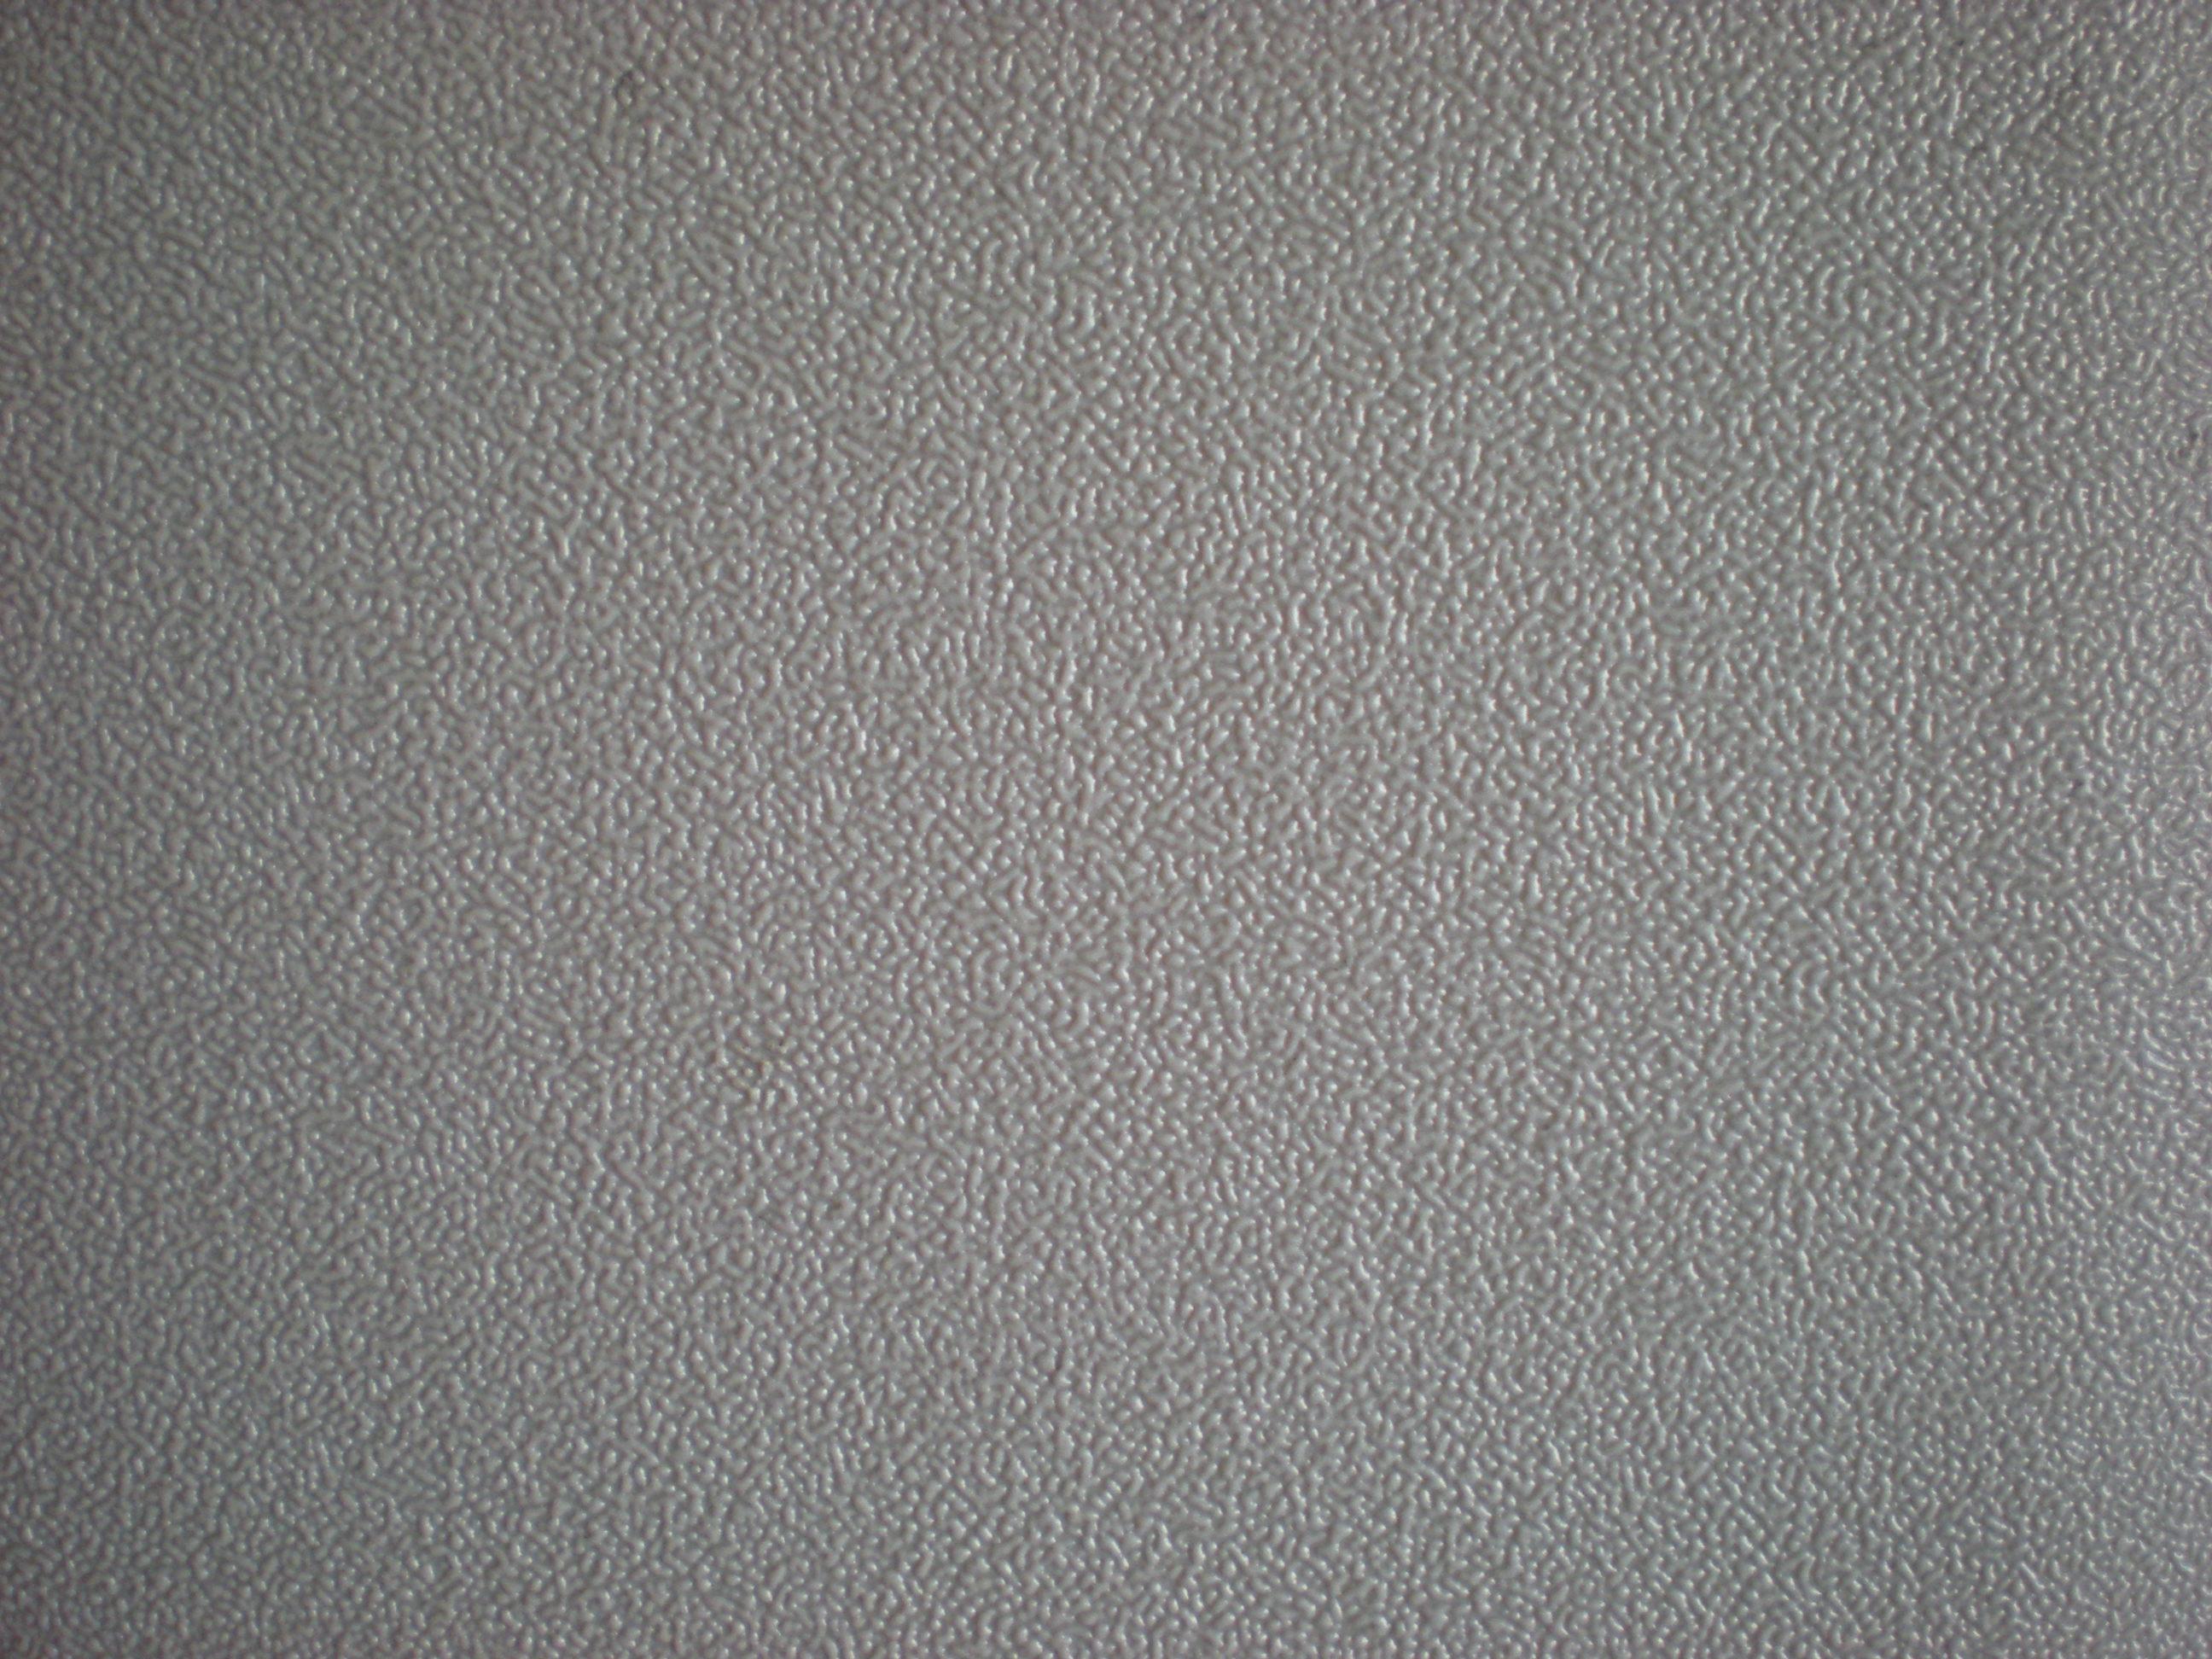 Plastic Material Background Twelve | Photo Texture & Background